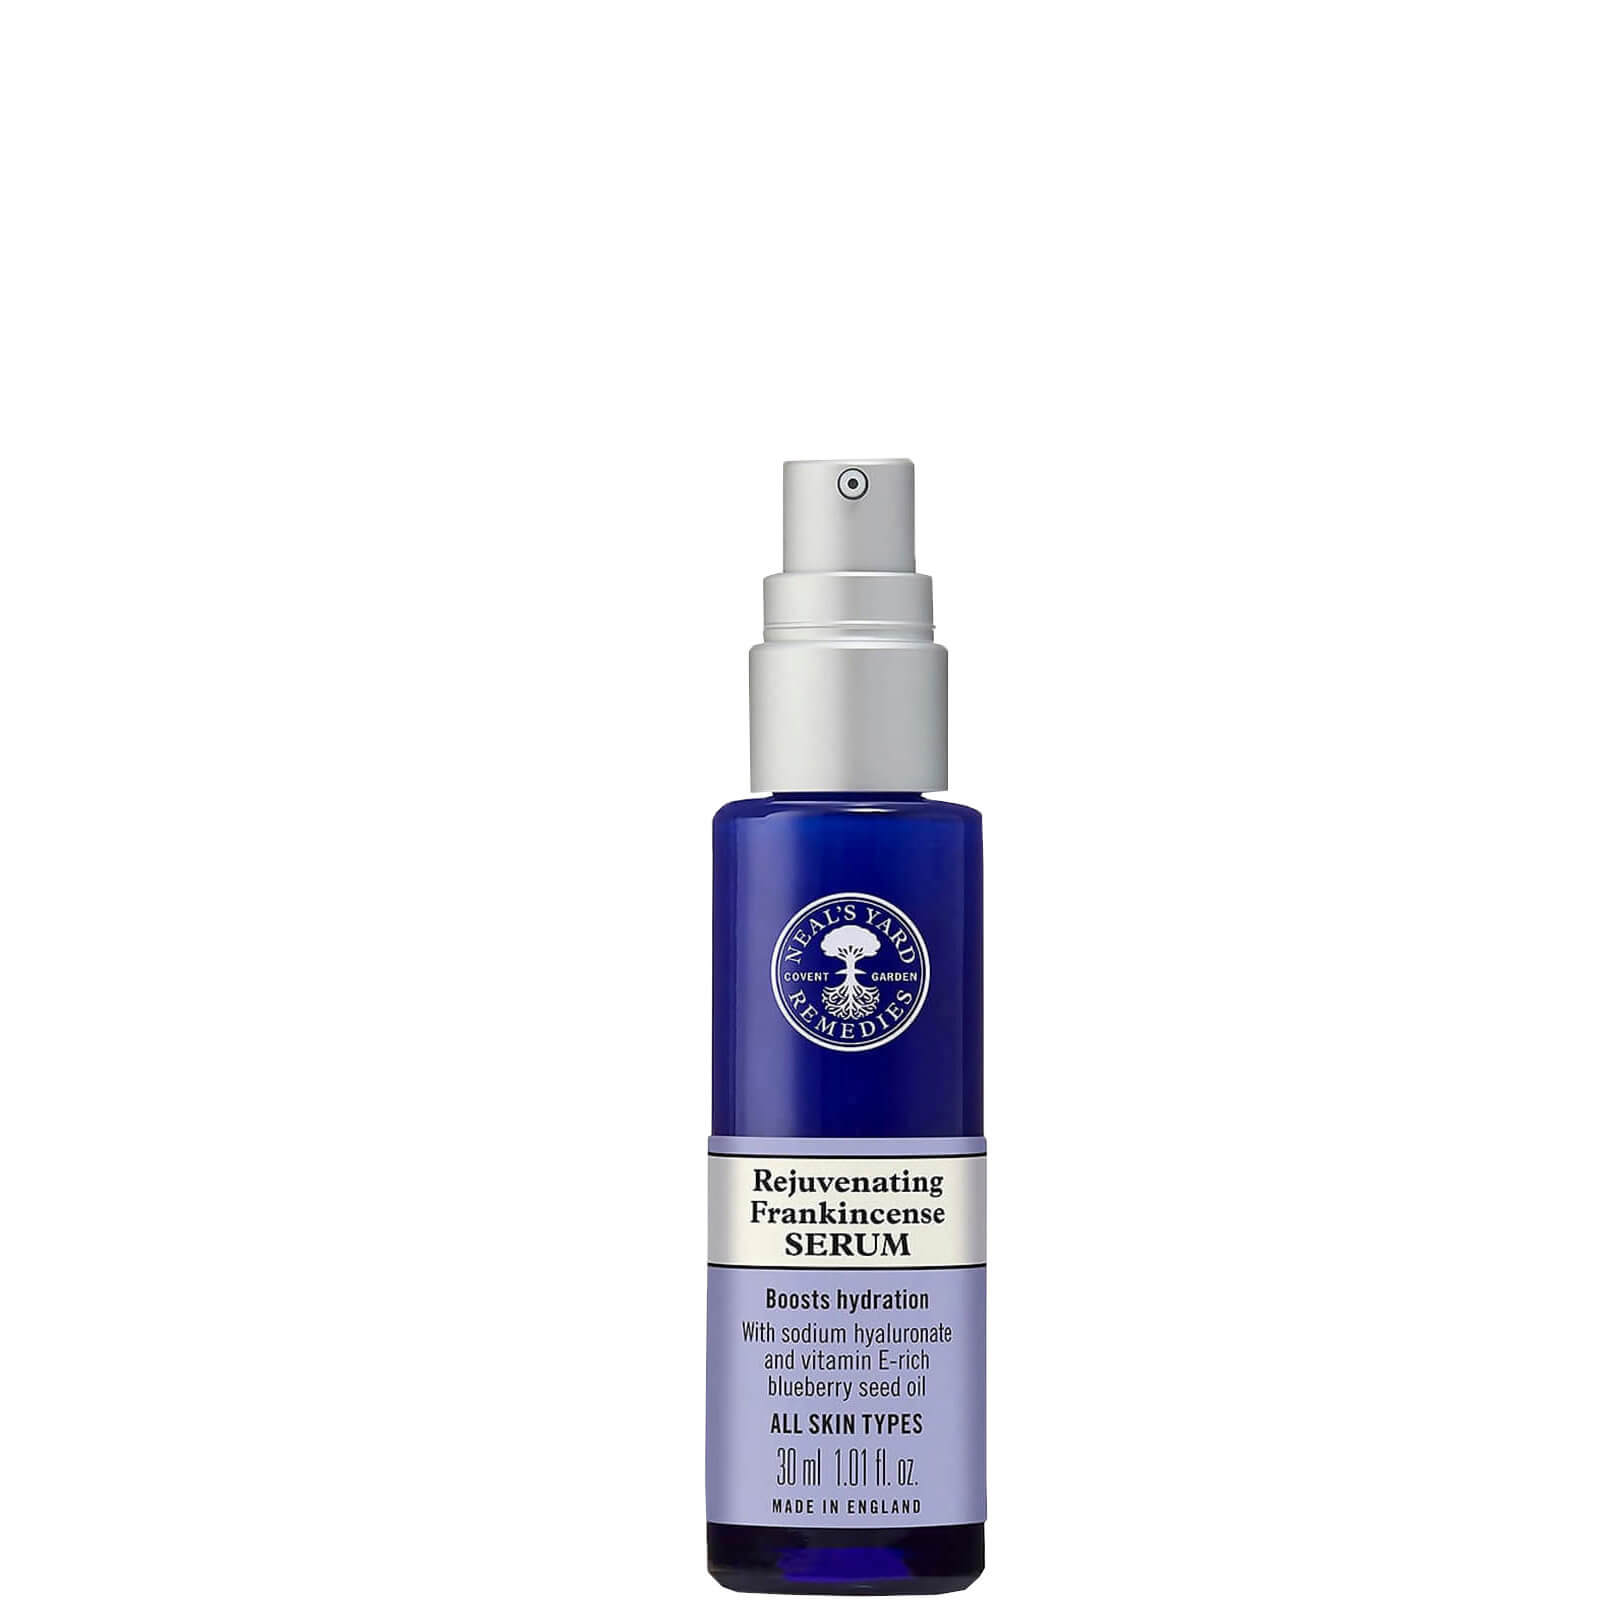 Neal's Yard Remedies Rejuvenating Frankincense Facial Serum 30ml